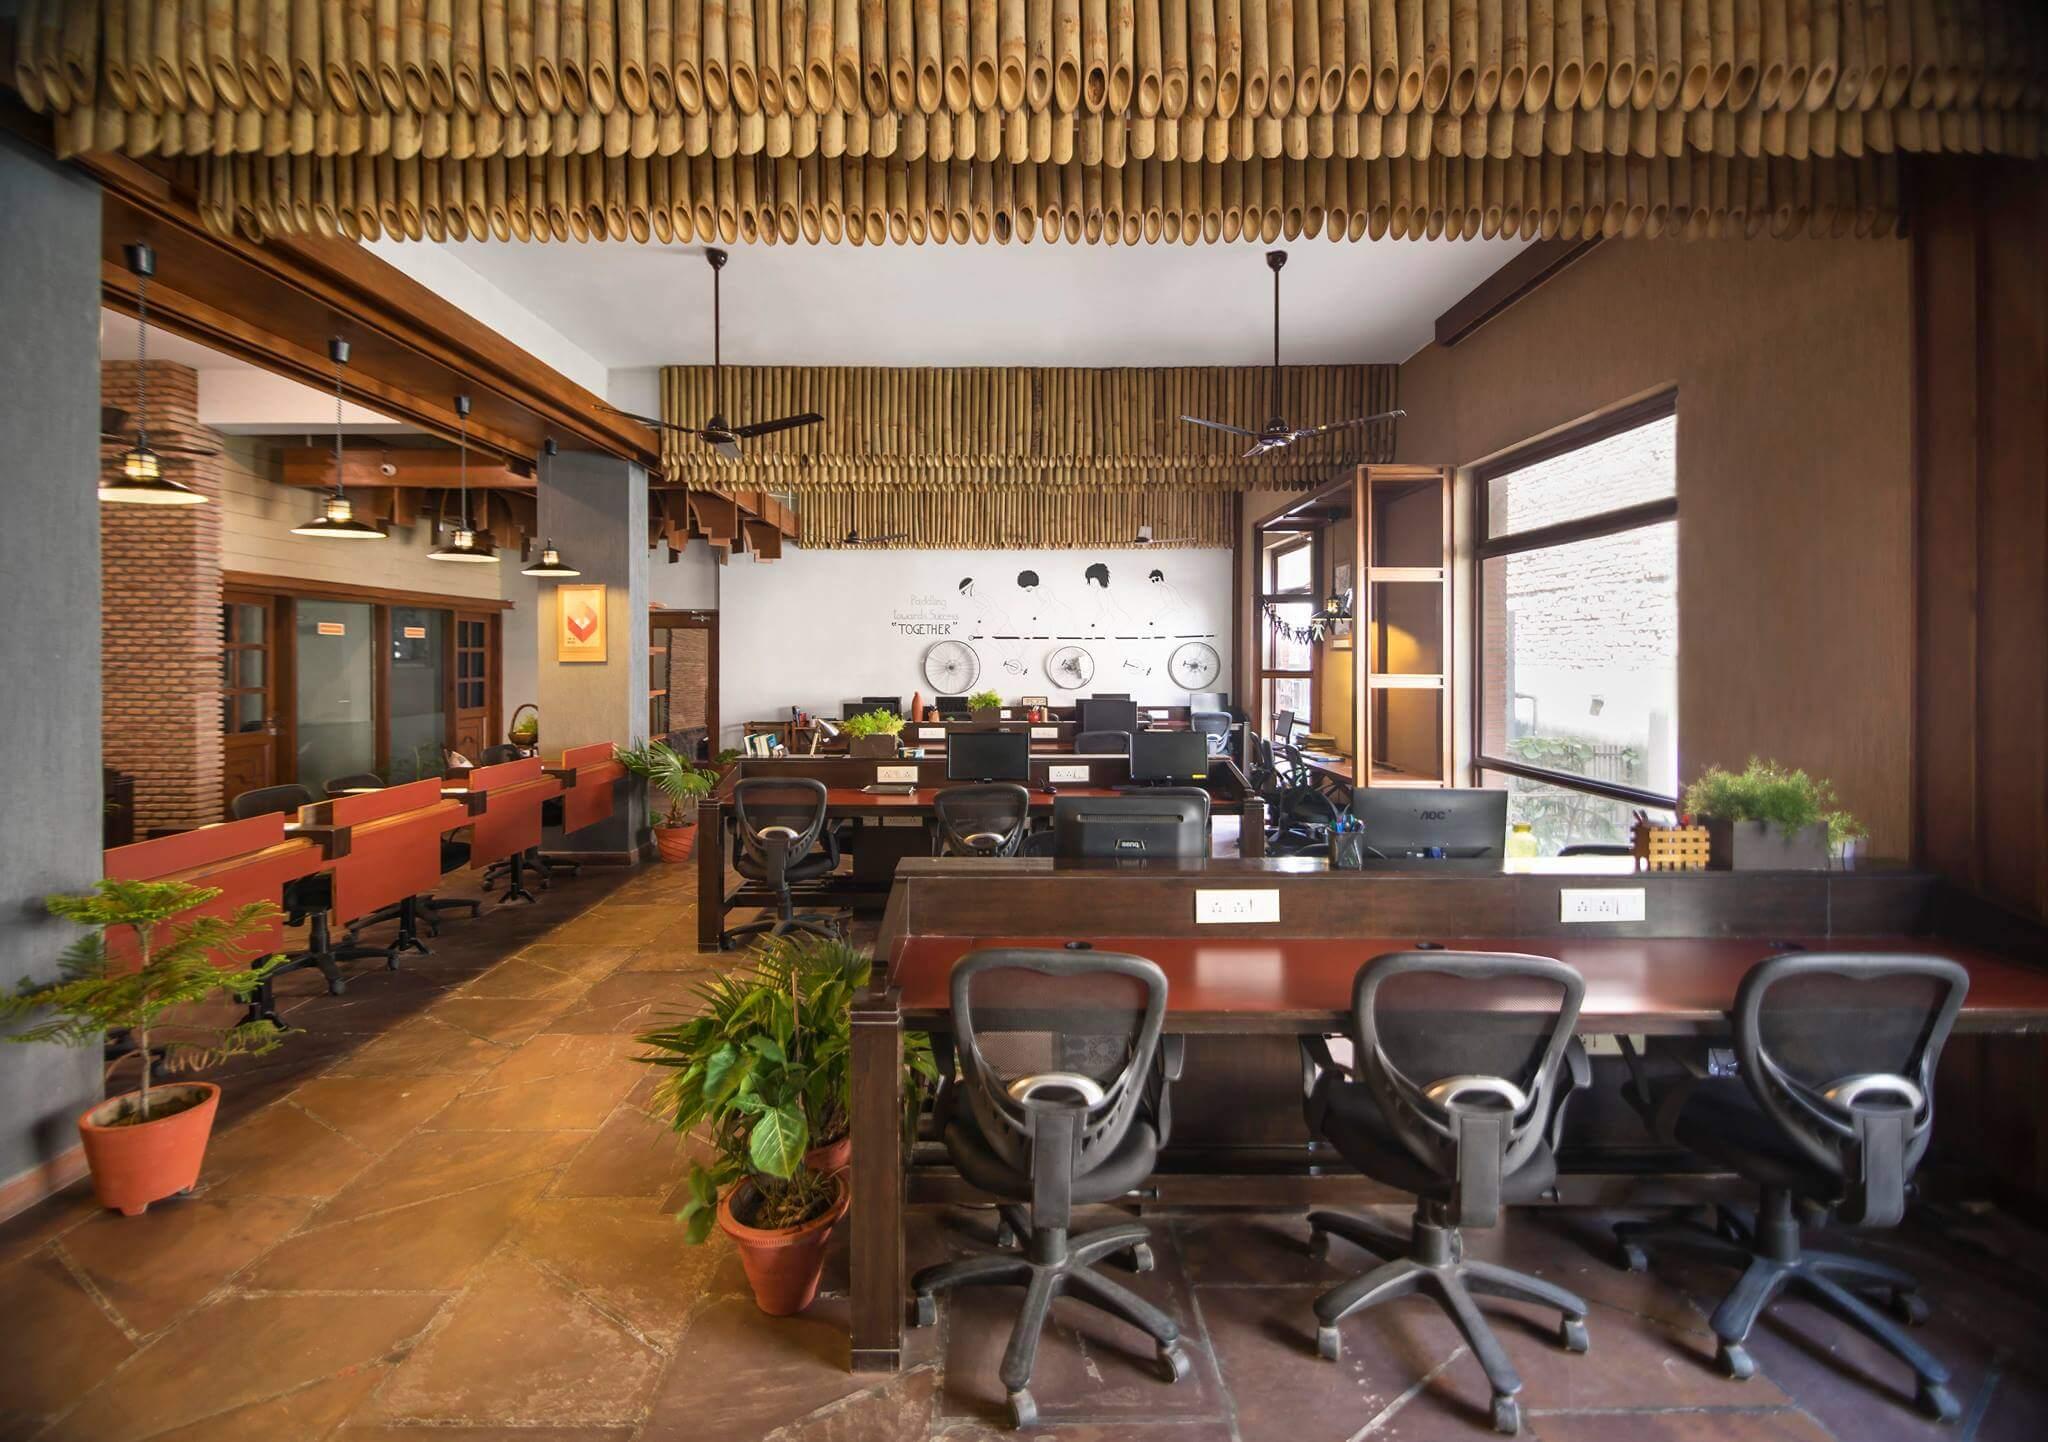 Unboxed Coworking Space in Noida